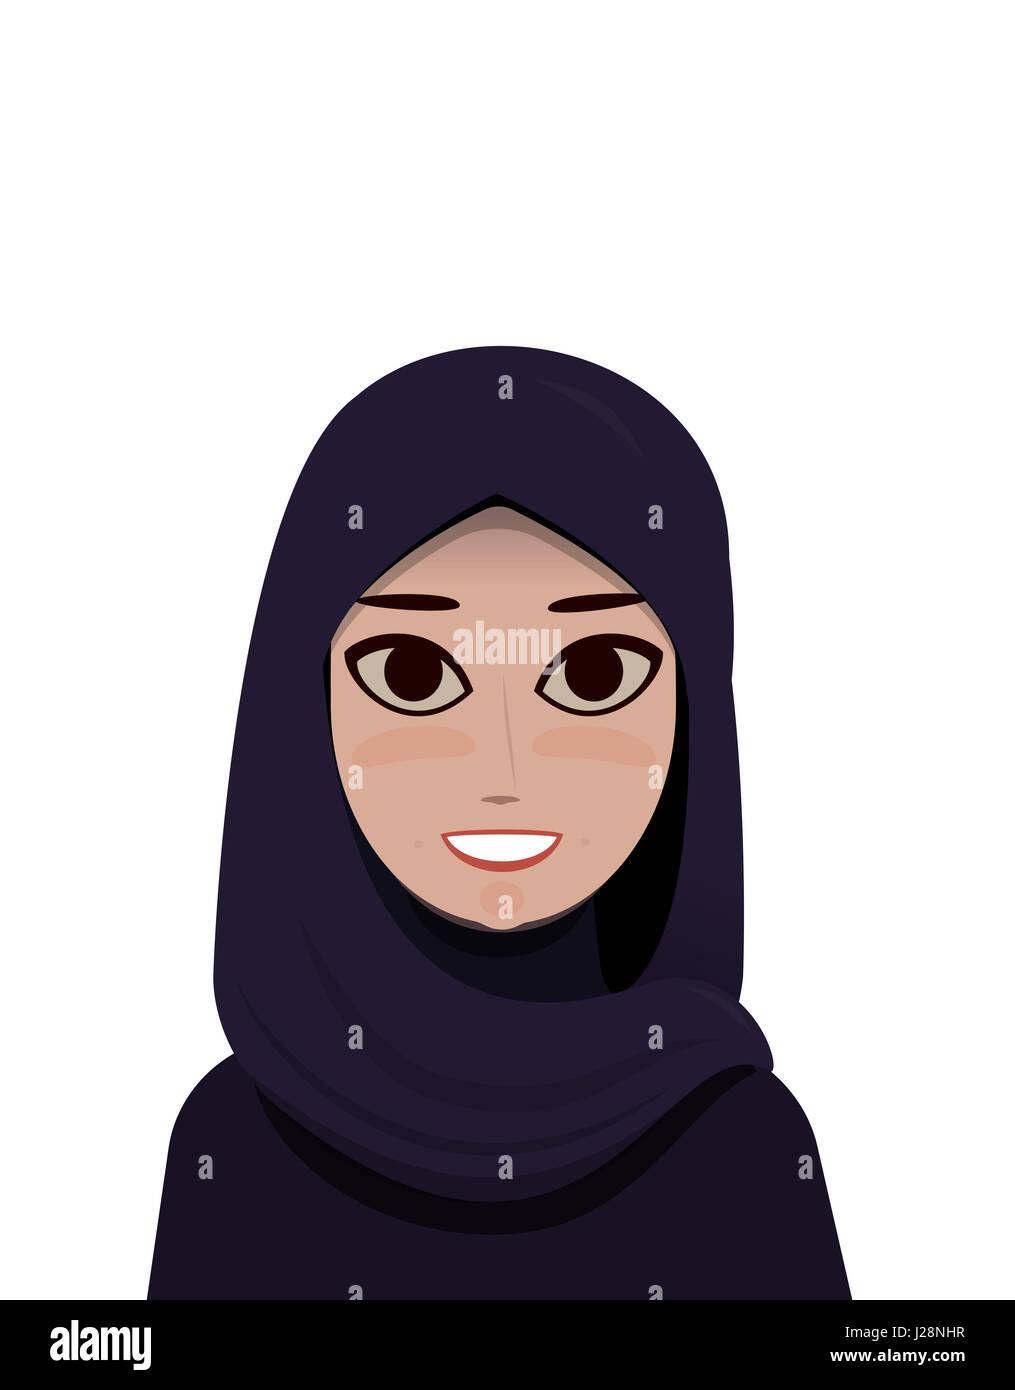 A muslim woman has the right to. Cartoon Girl Hijab Immagini E Fotos Stock Pagina 3 Alamy